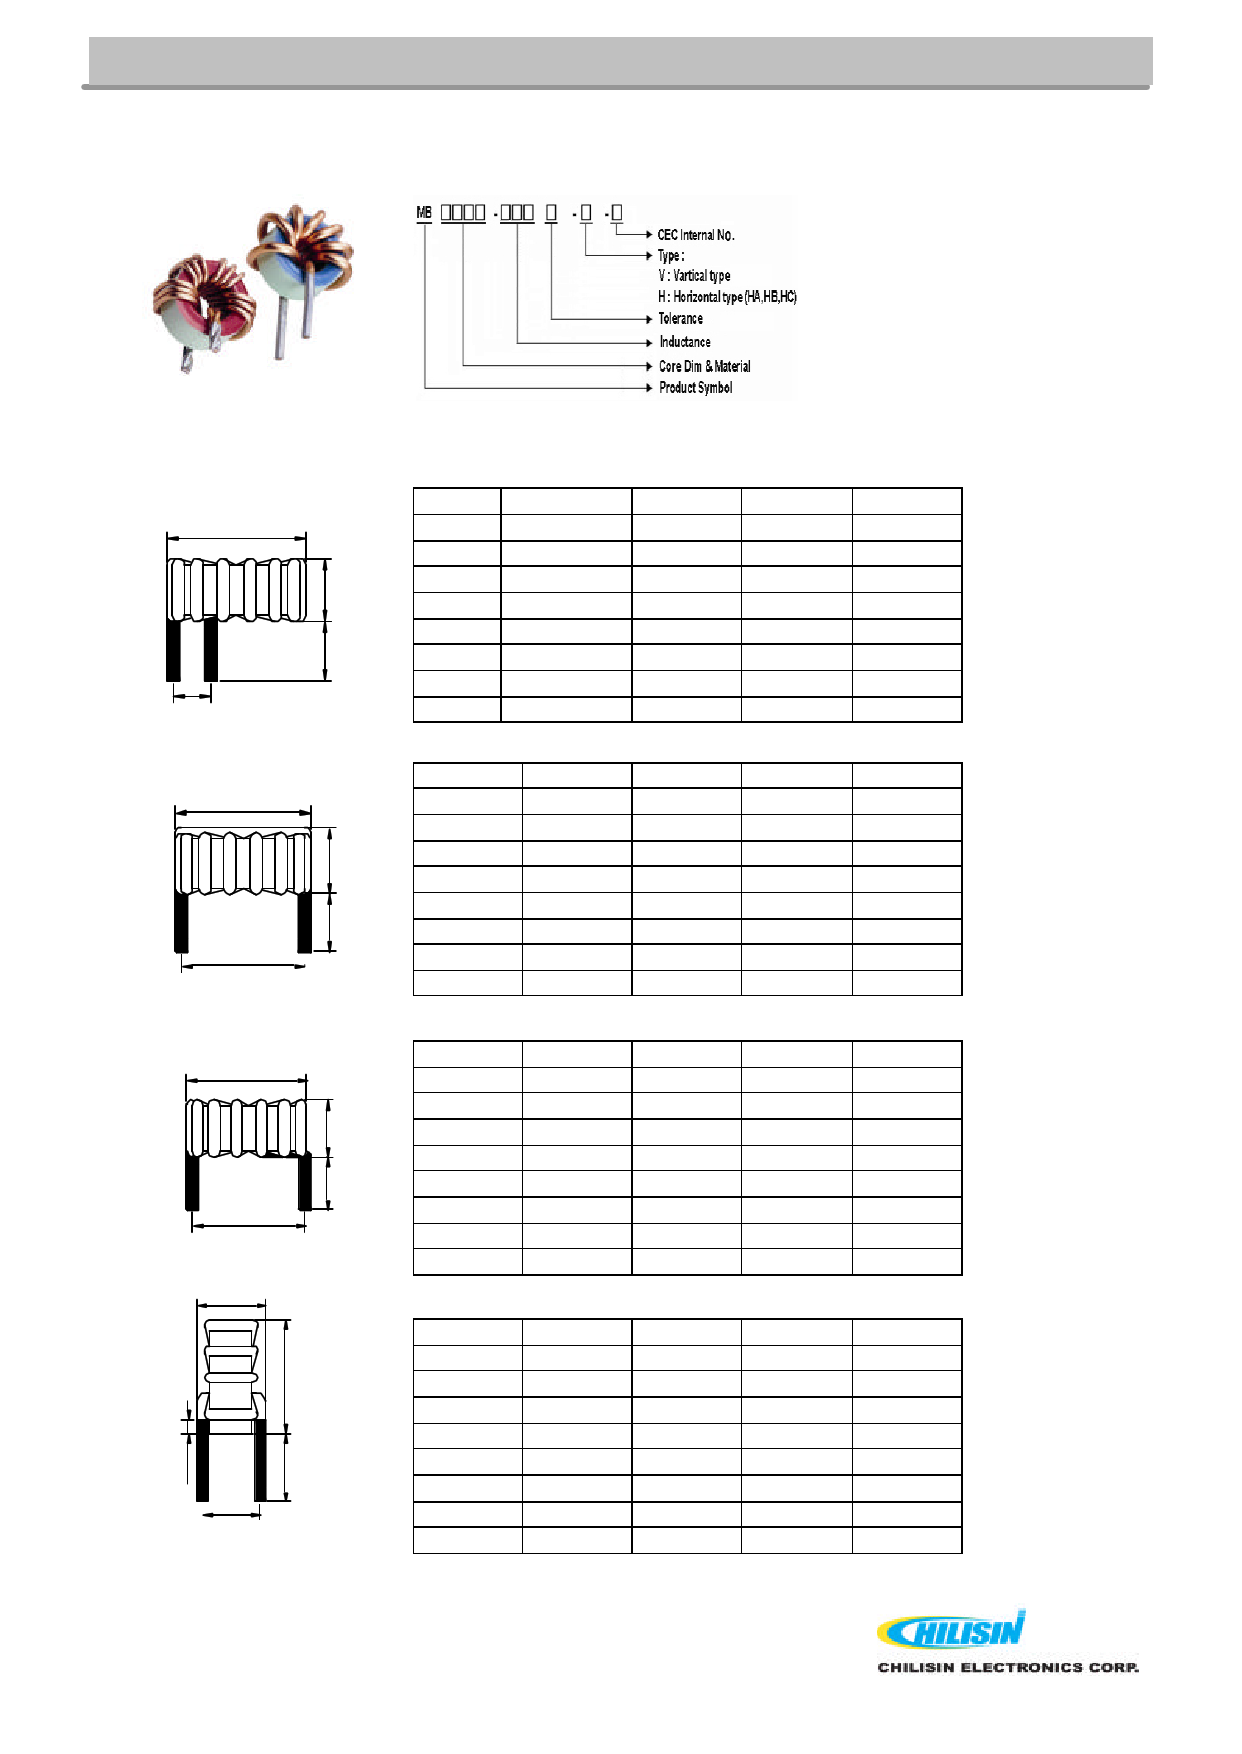 MB6018 데이터시트 및 MB6018 PDF